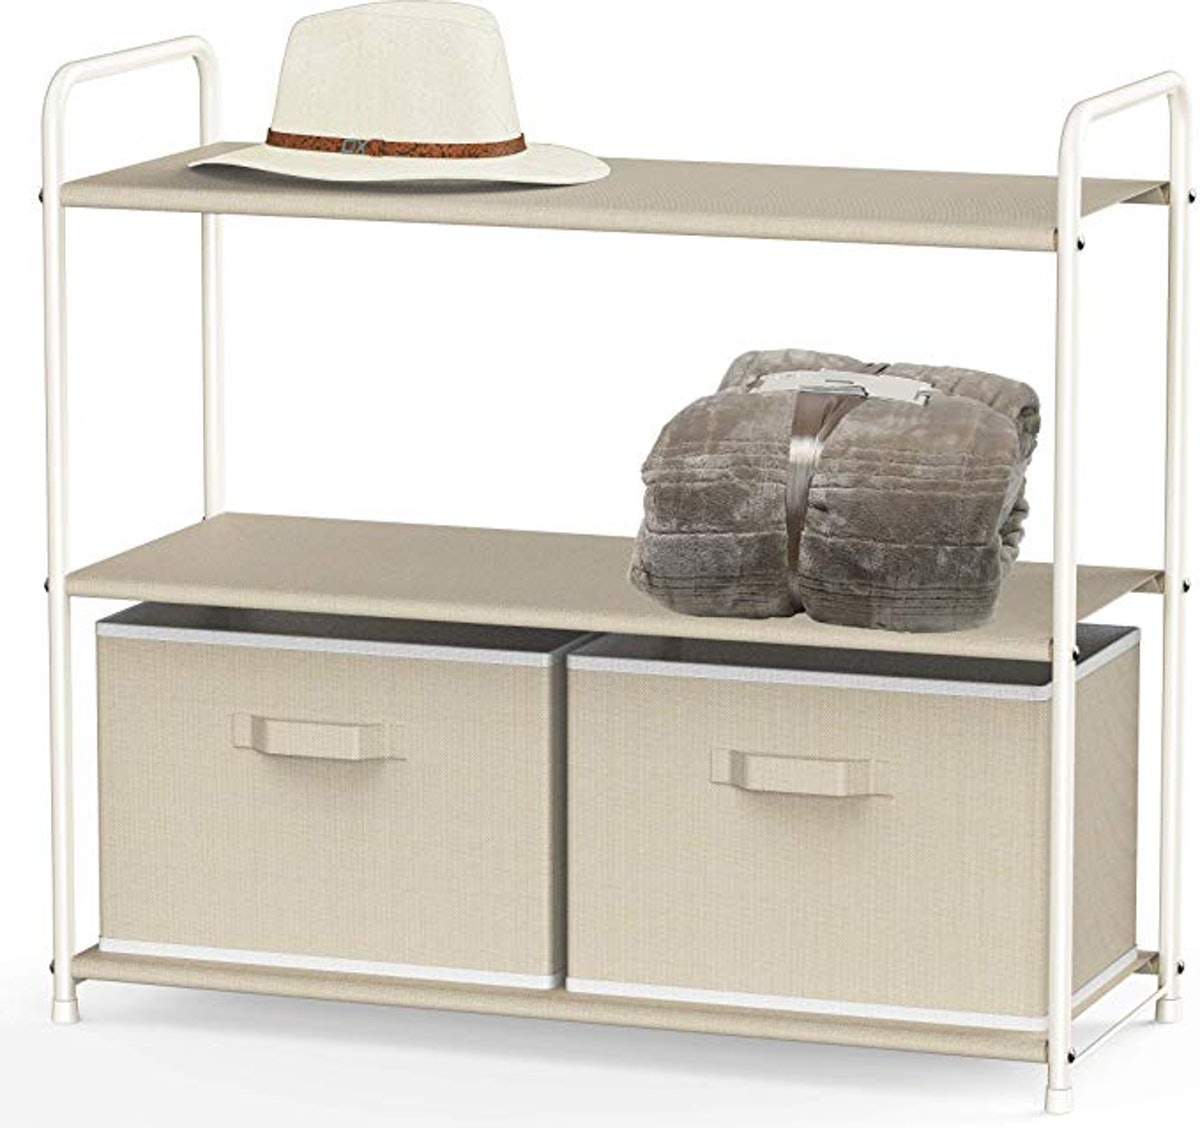 Simple Houseware Closet Storage With 2 Drawers